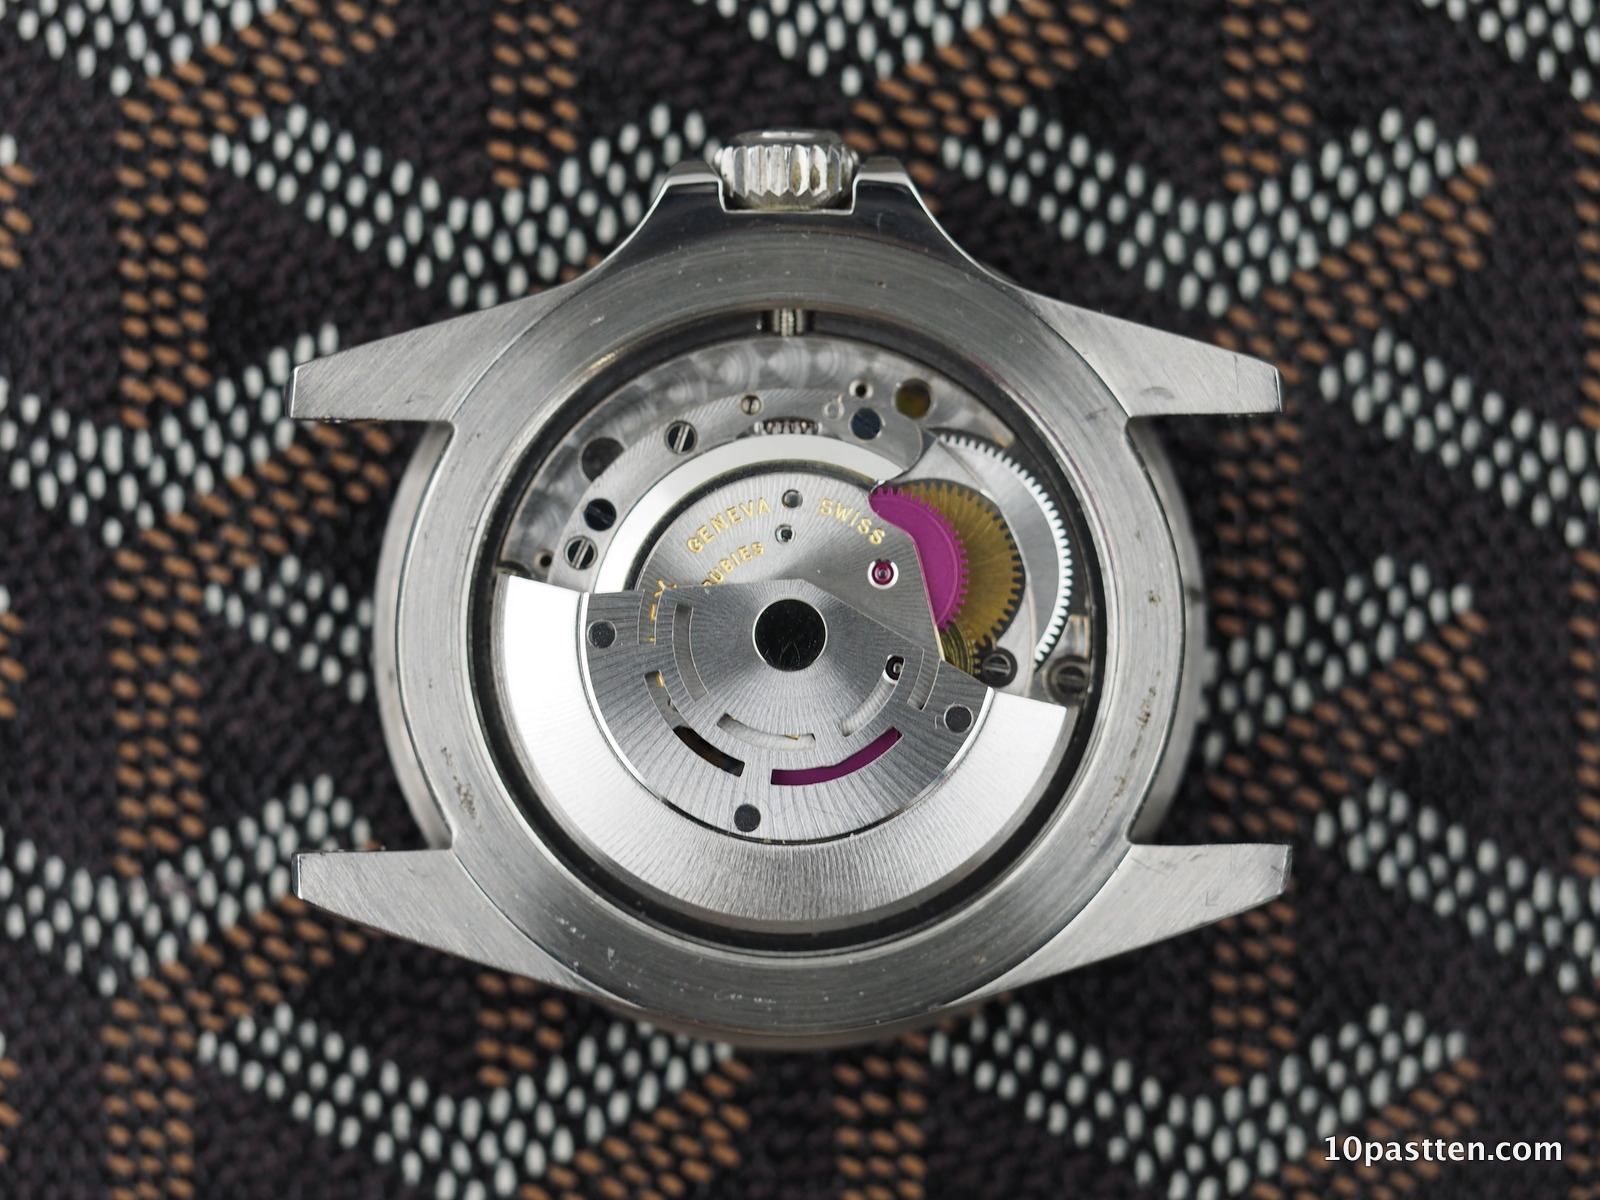 Rolex Ref 5513 movement - 10pastten.jpg